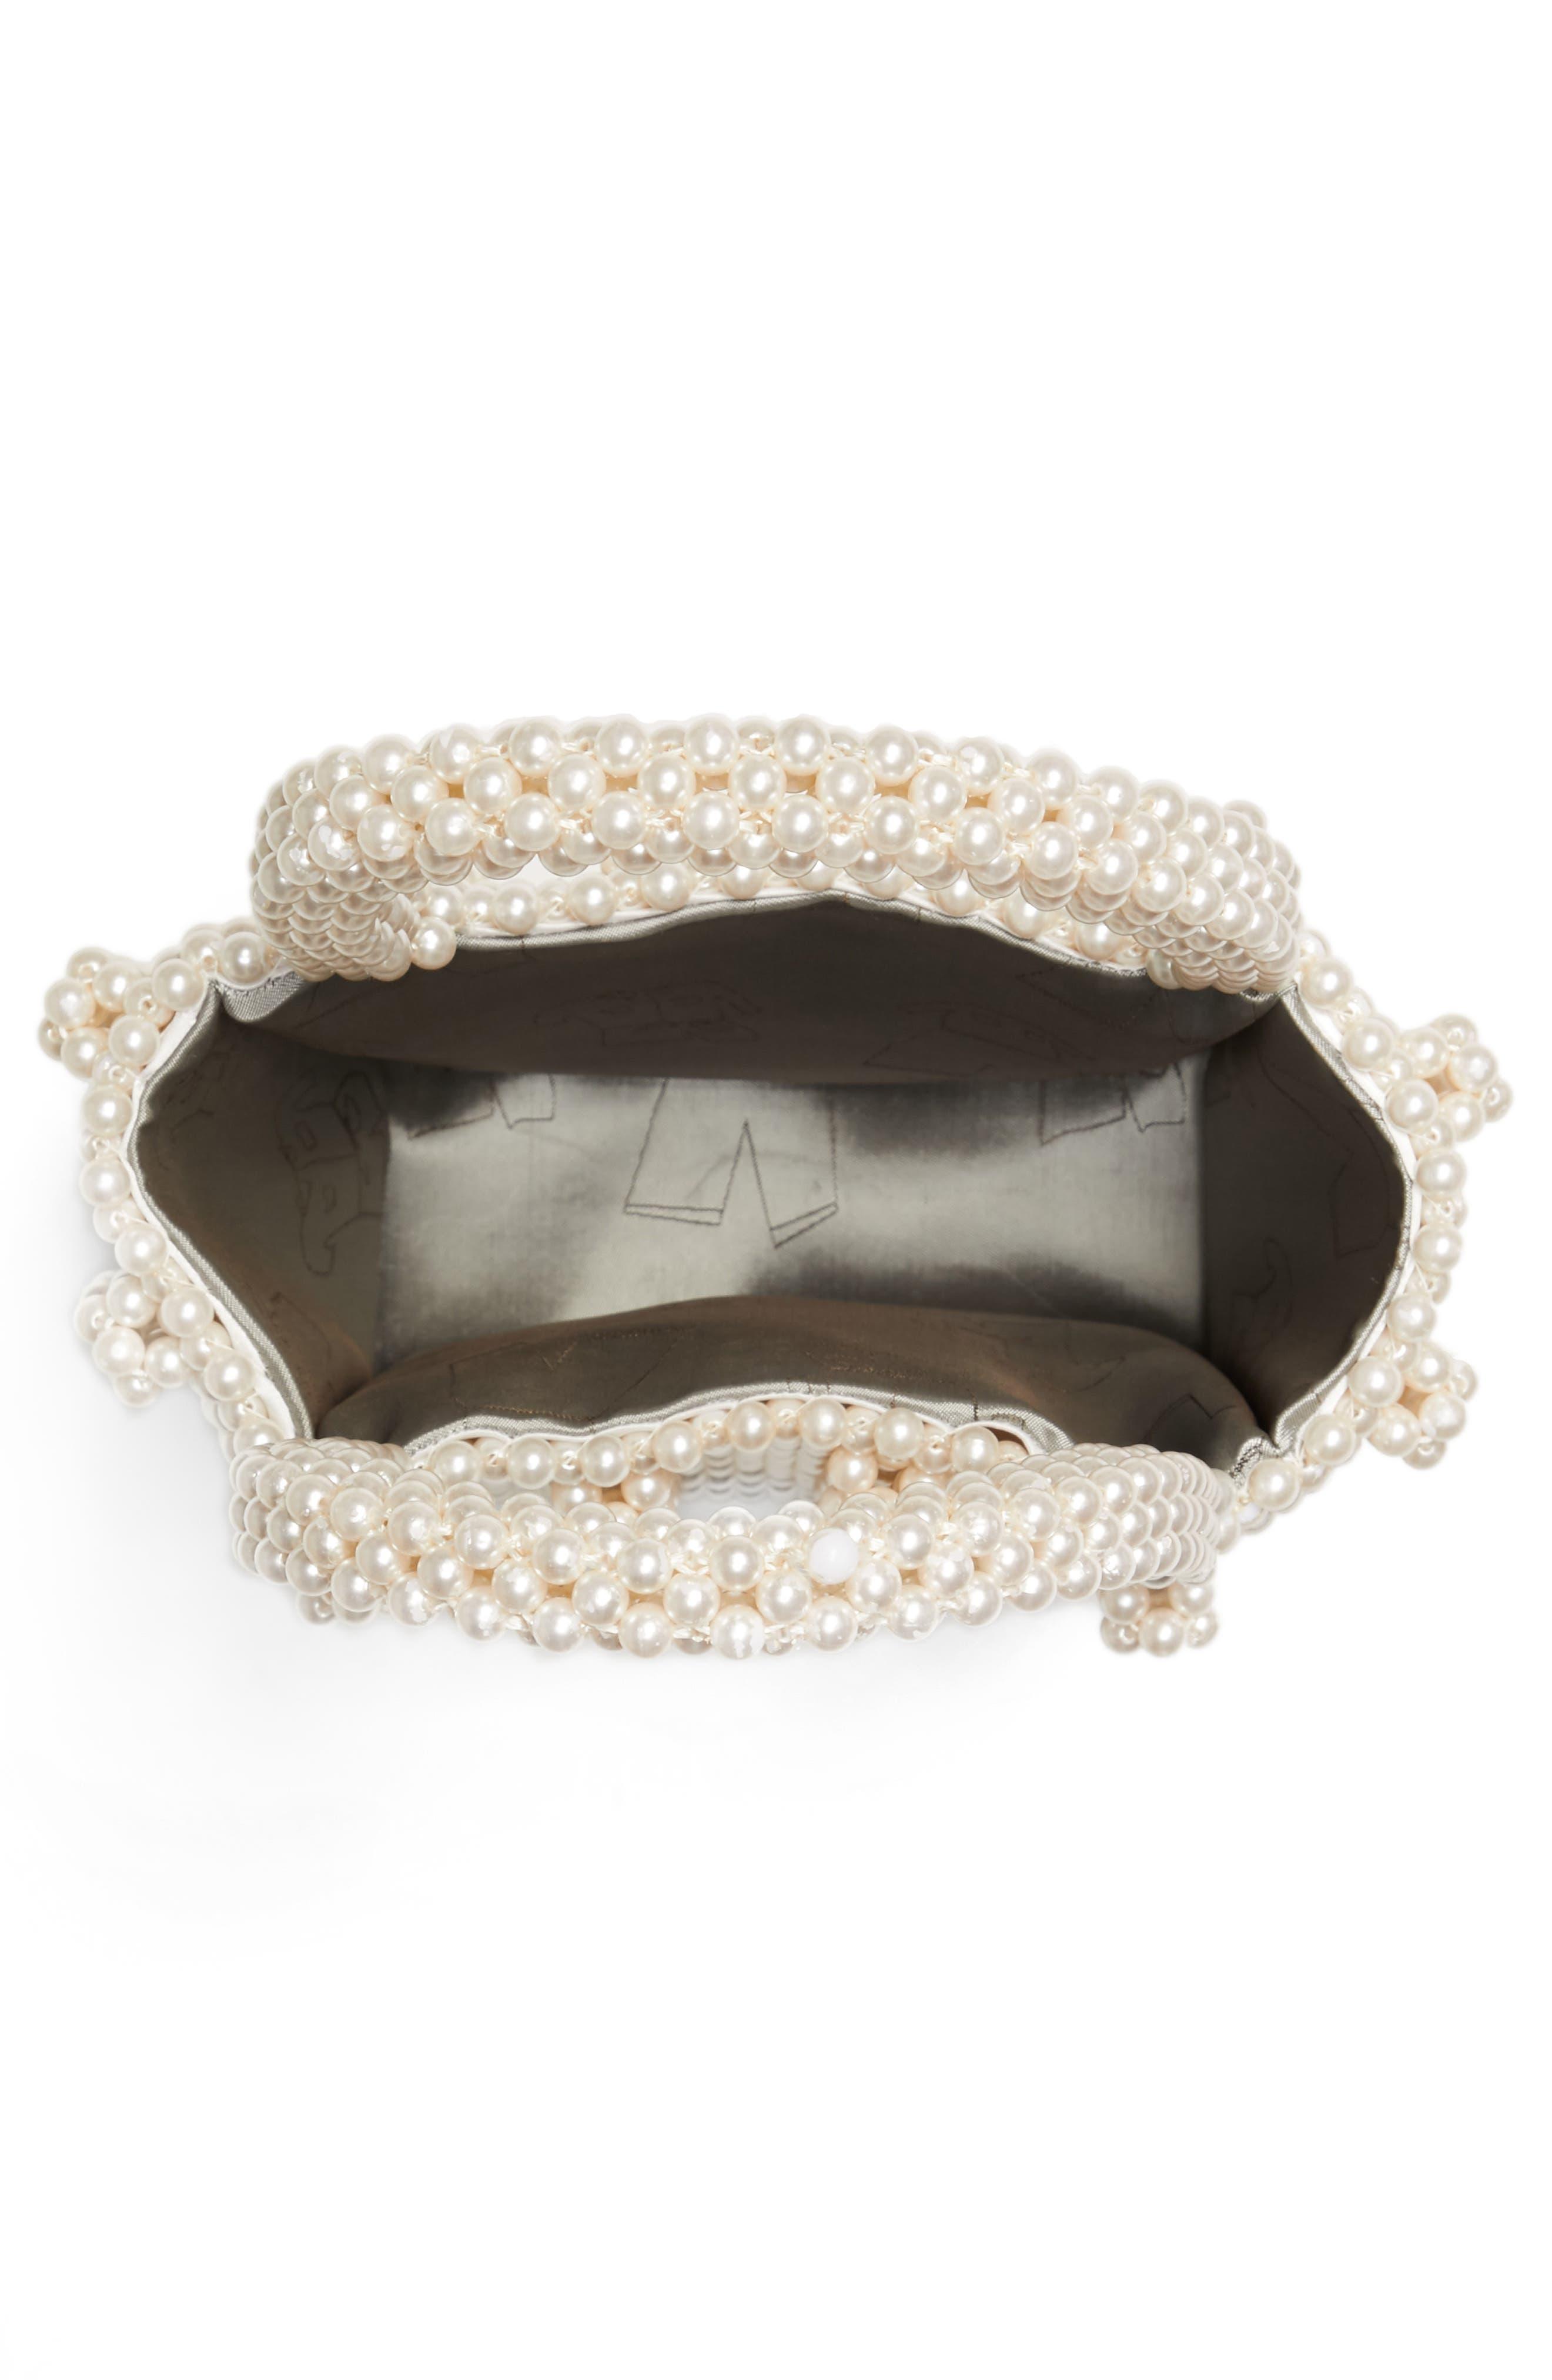 Antonia Small Imitation Pearl Beaded Handbag,                             Alternate thumbnail 4, color,                             900